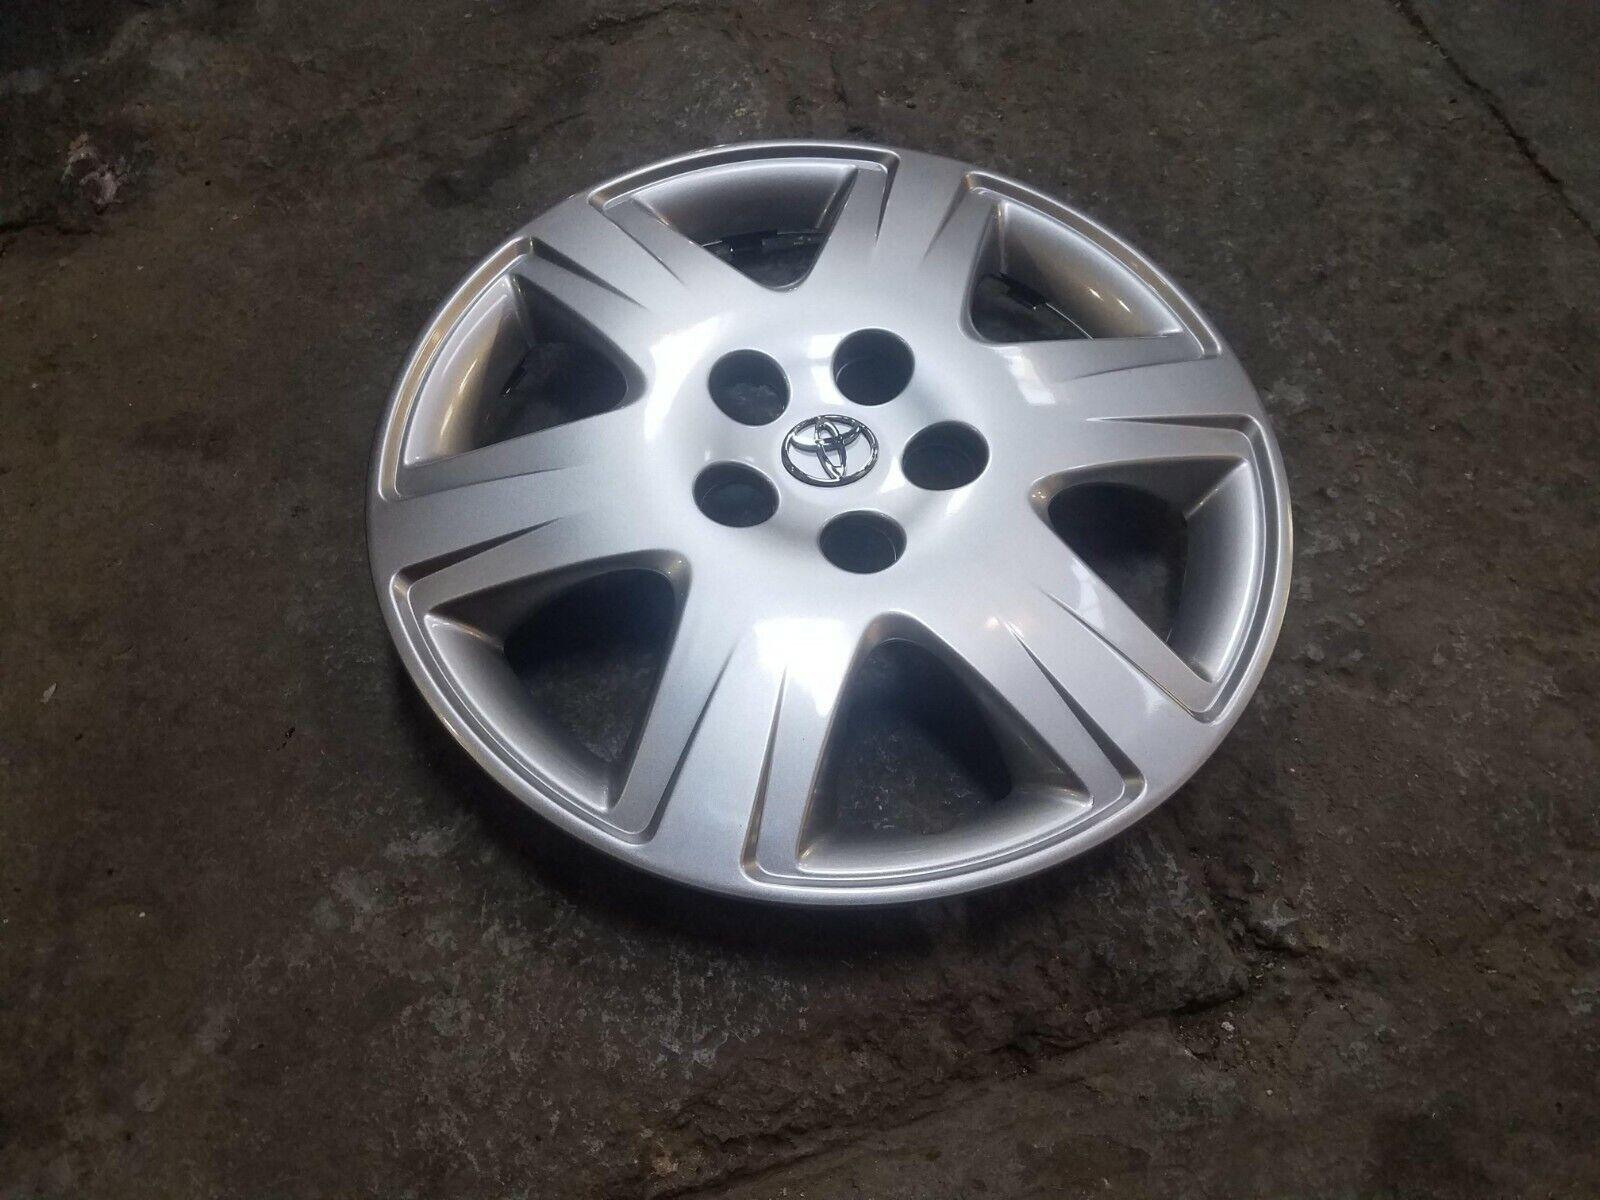 1 Brand New 2003 2004 2005 2006 2007 2008 Corolla 15  Hubcap Wheel Cover 61133